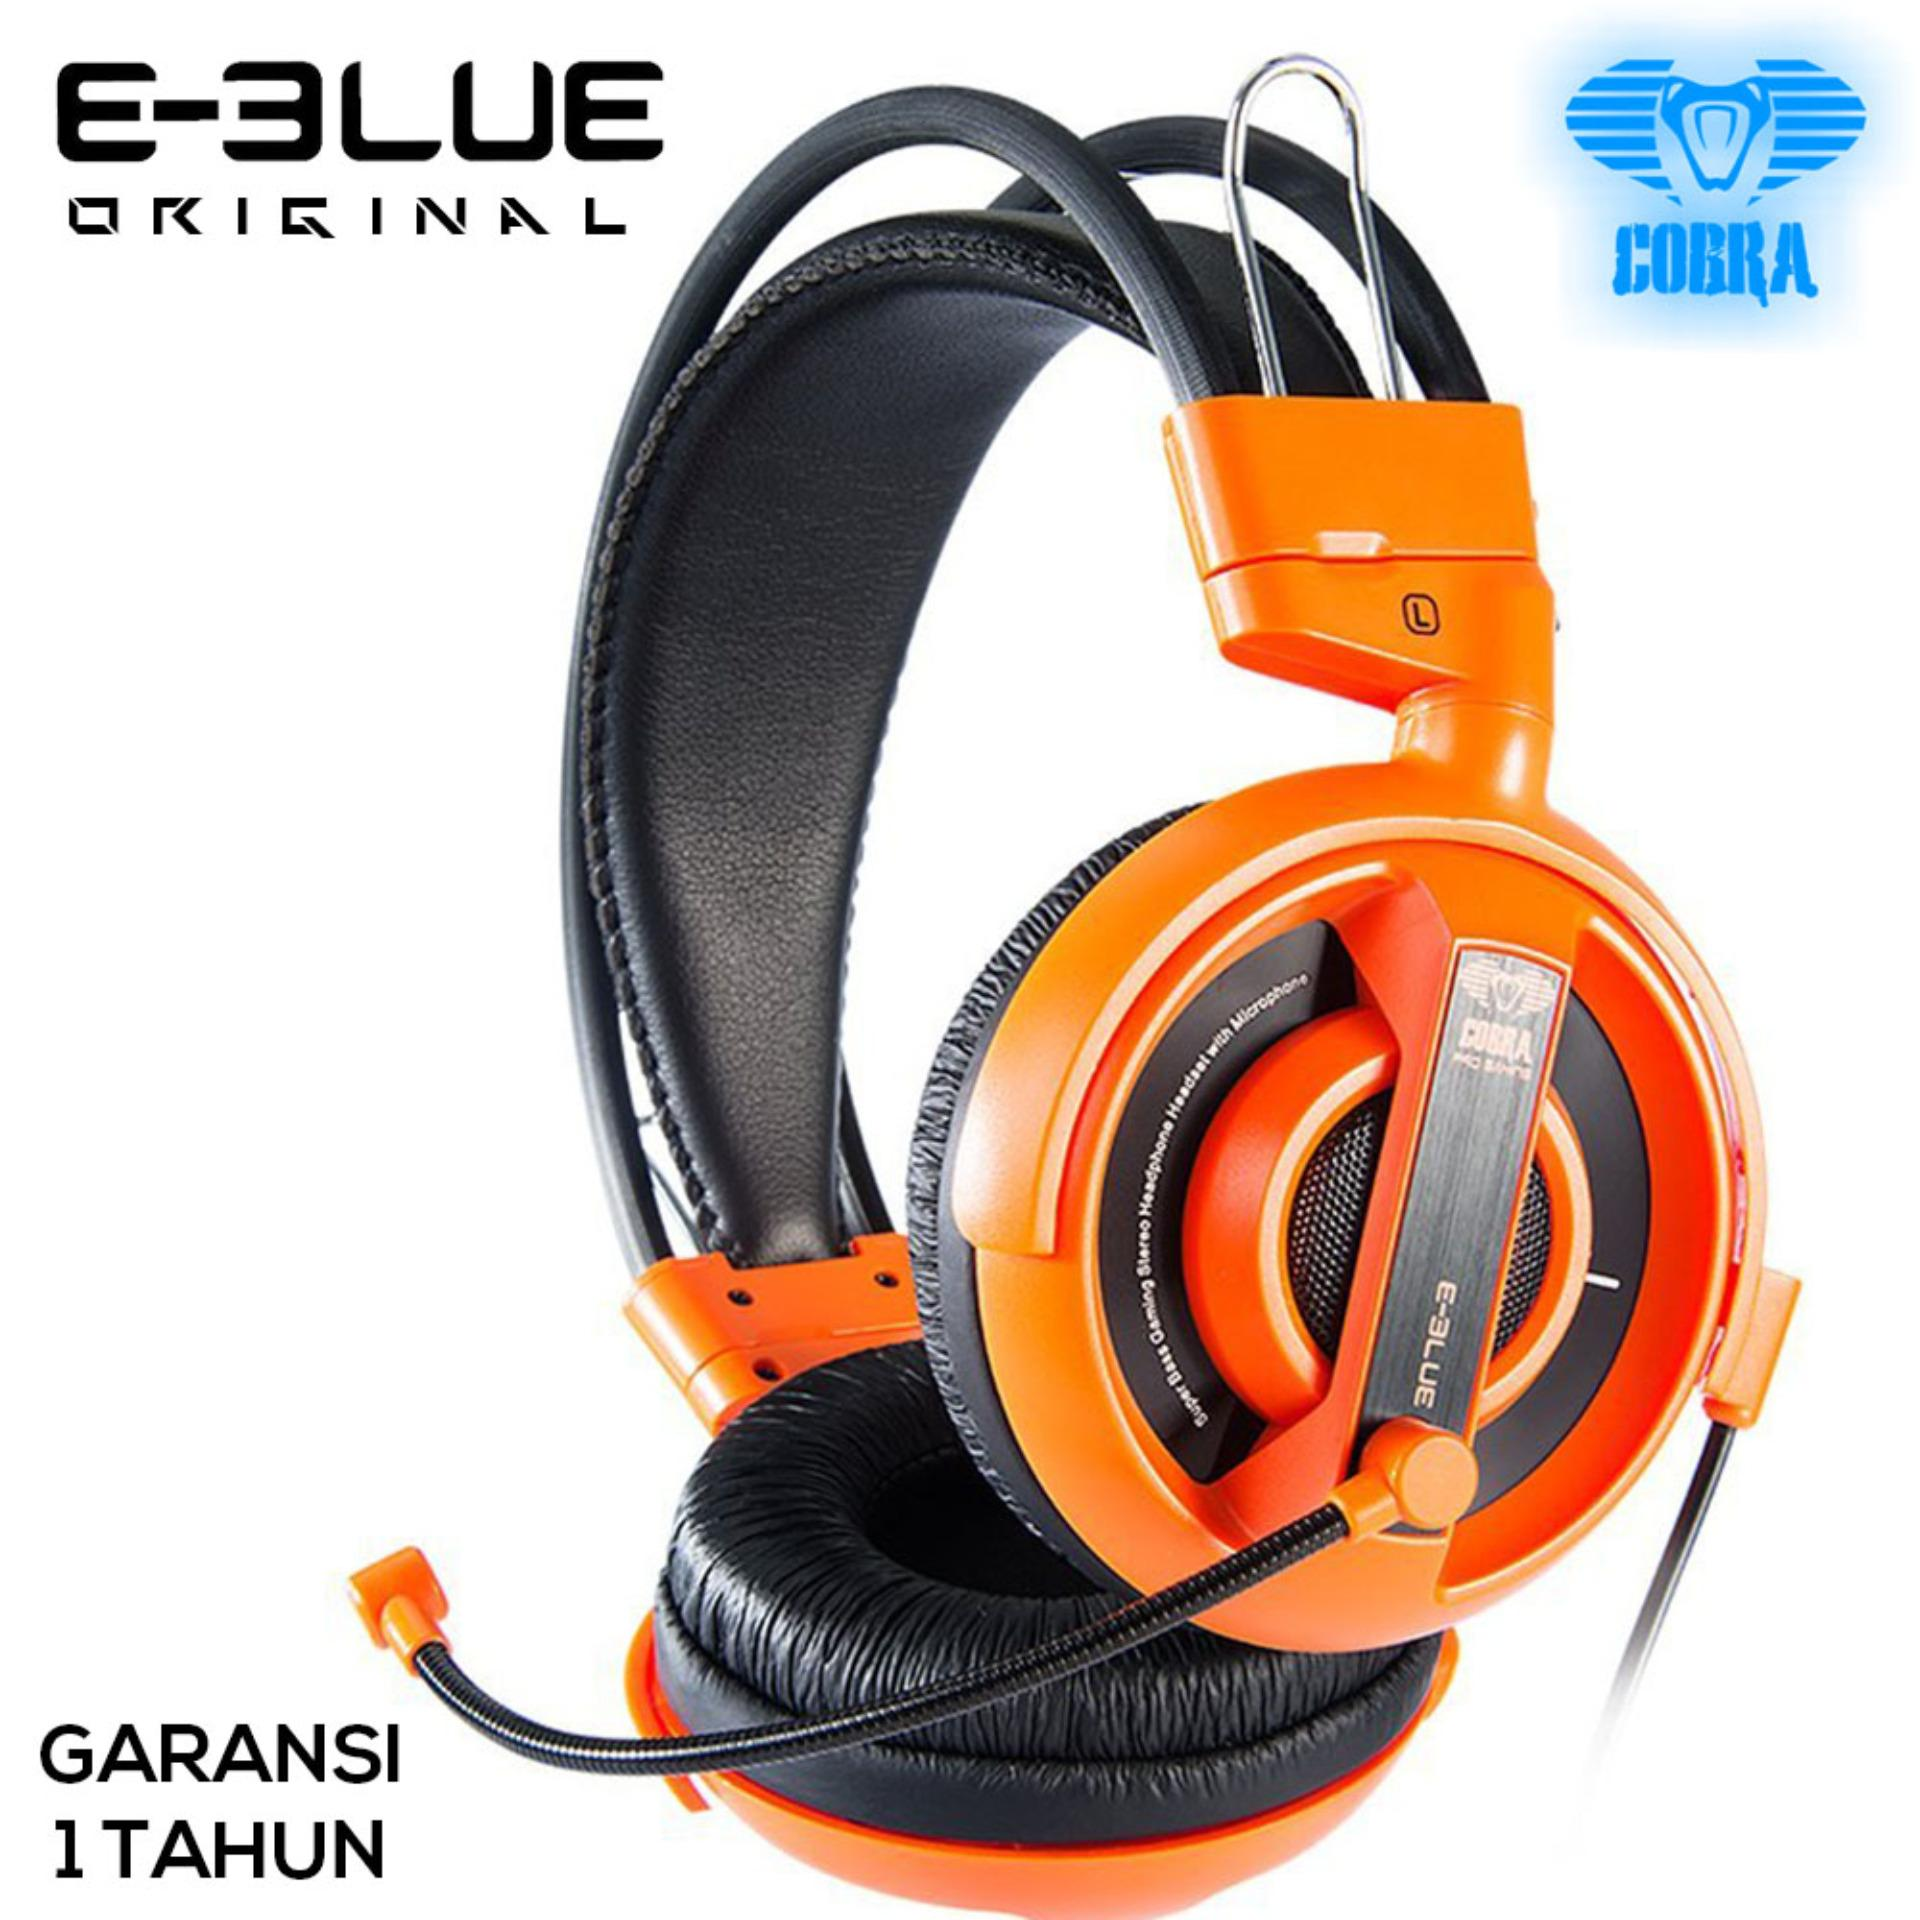 Lihat Tas E M O R Y Gashinna Series 0793 03emo1522su Dan Harga Whitelust Fullblack Rapier Casual Sandal Hitam 39 Blue Cobra Professional Gaming Headset Ehs013 Orange